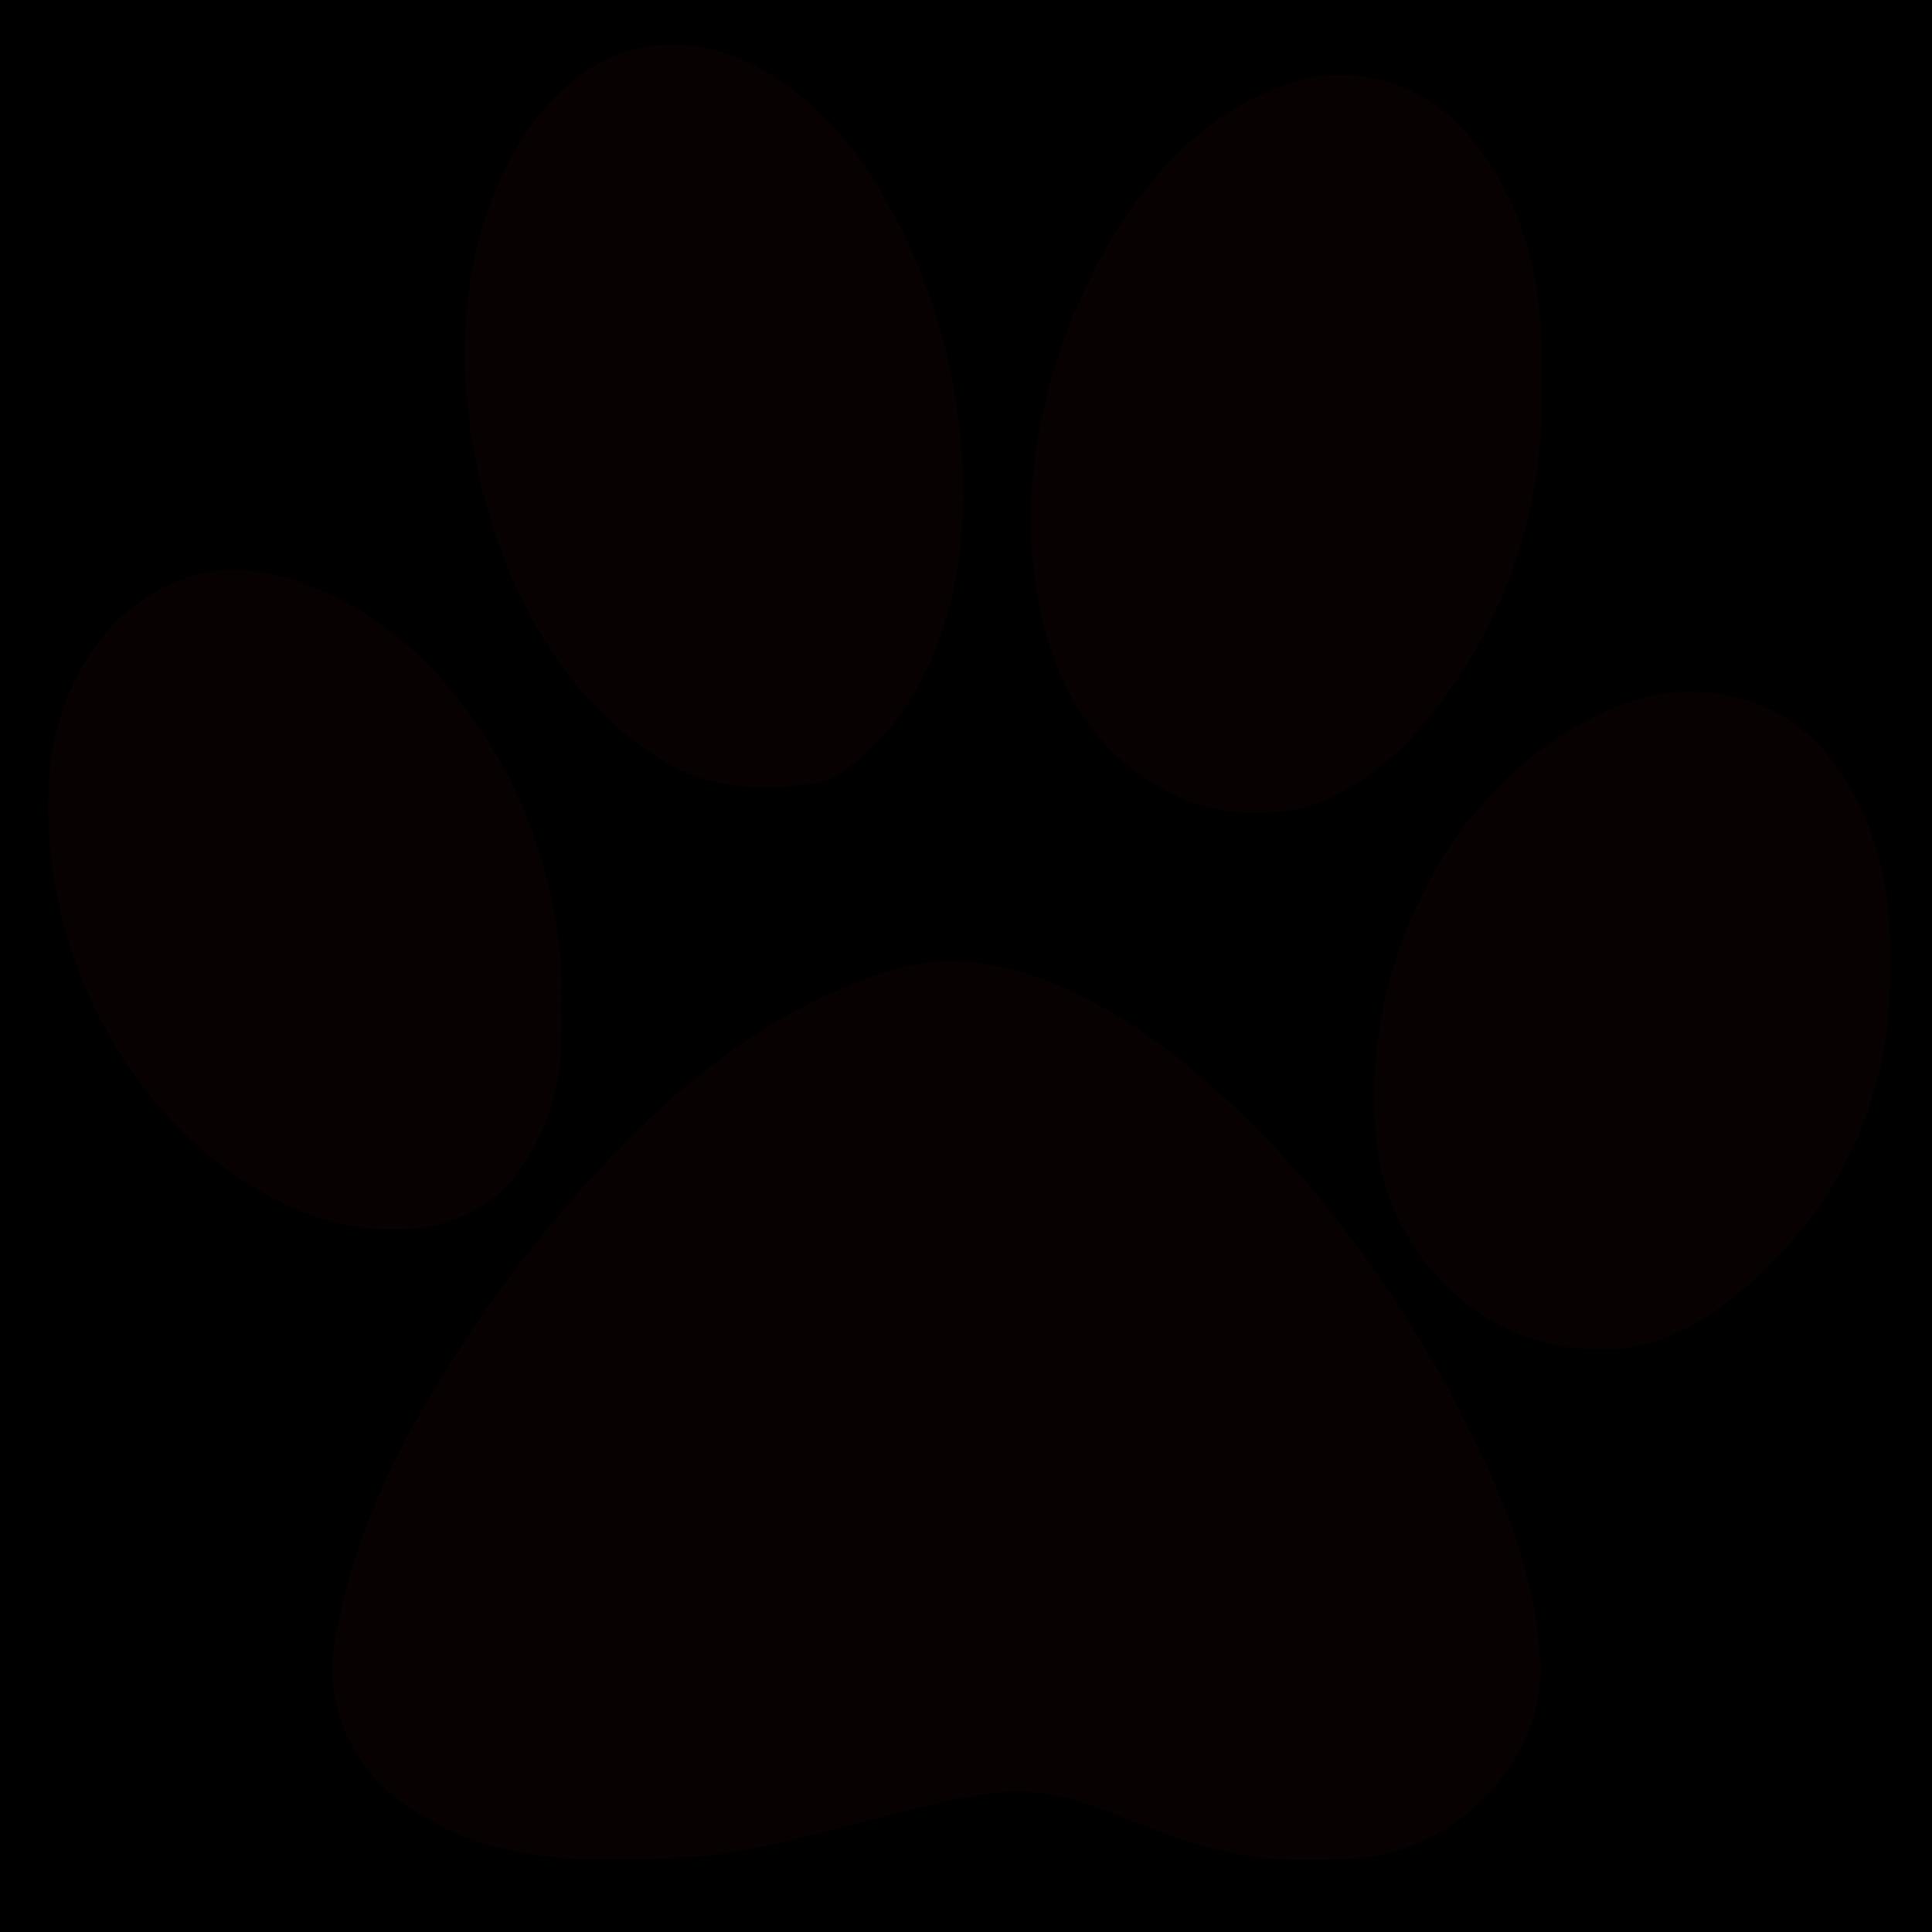 2500x2500 Clipart Dog Paw